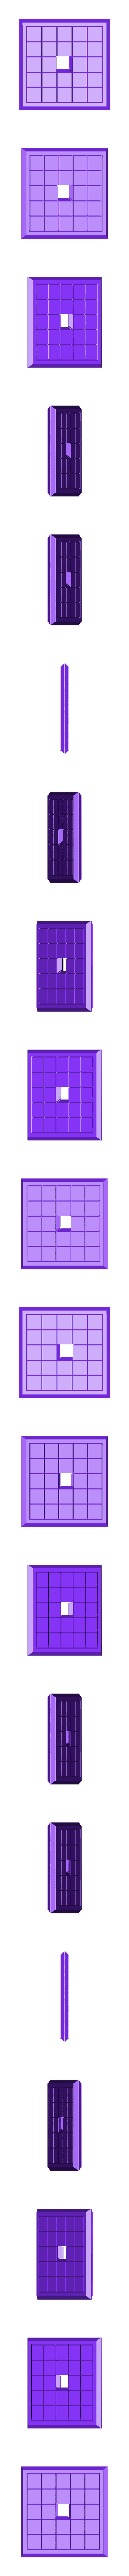 Sliding5x5BlankPuzzle7.stl Download STL file Two Sided Sliding Puzzle • 3D printable model, Jinja